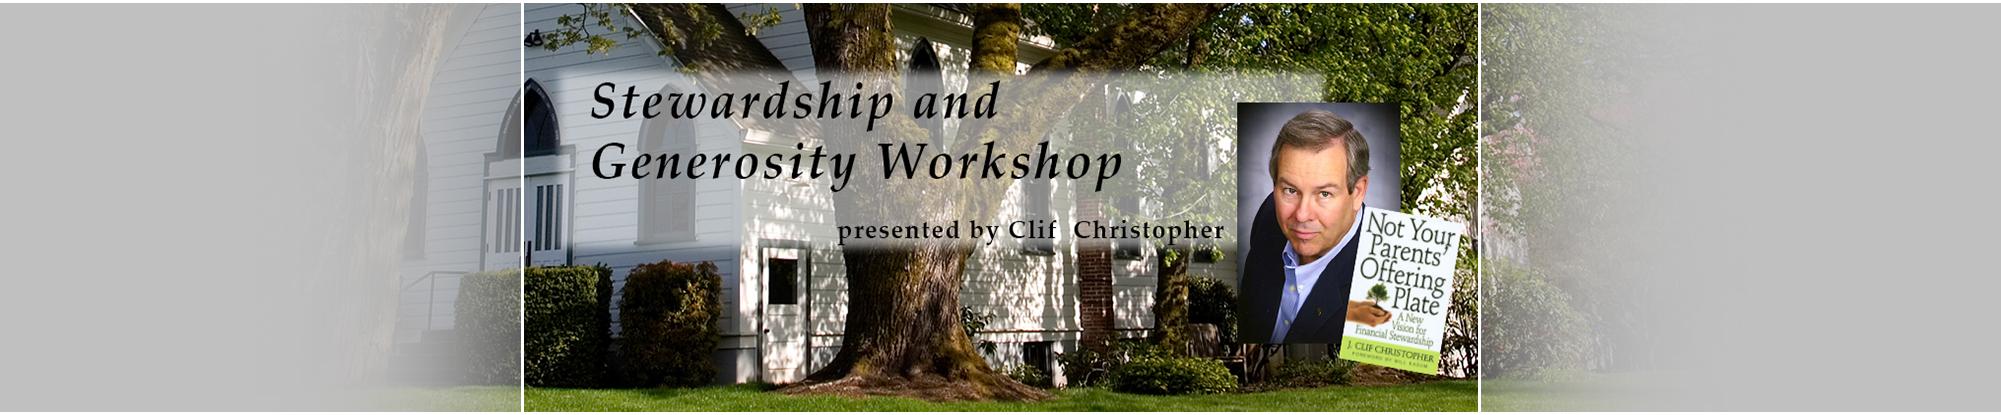 Homepagebanner-template-stewardship-and-generosity-workshop-bannerl.jpg